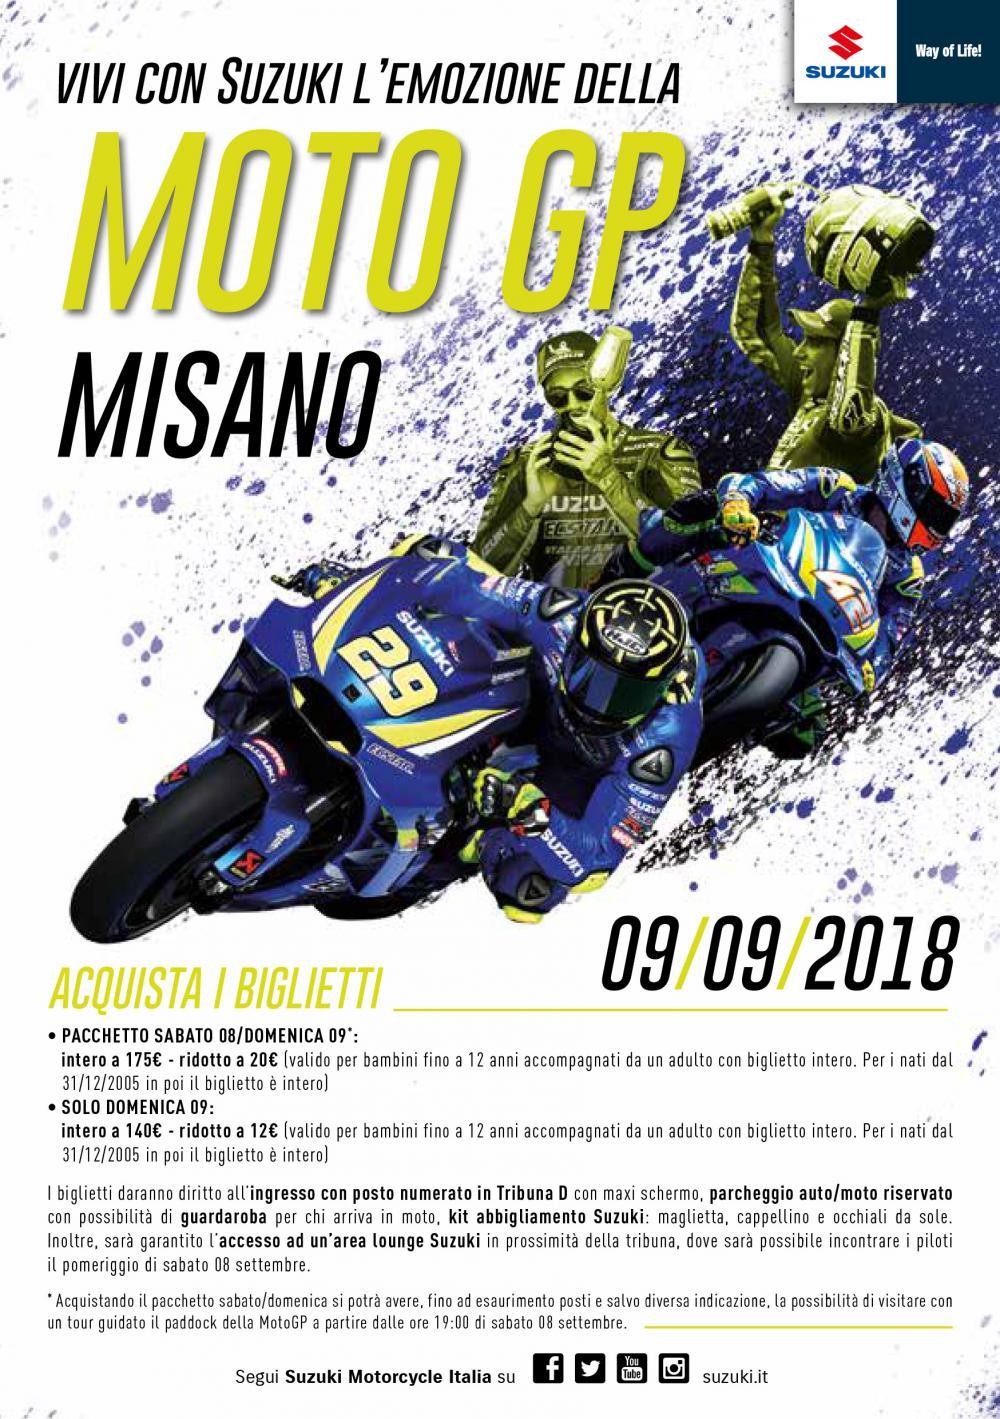 Biglietti MotoGP 2018 Misano per la tribuna Suzuki - Motociclismo